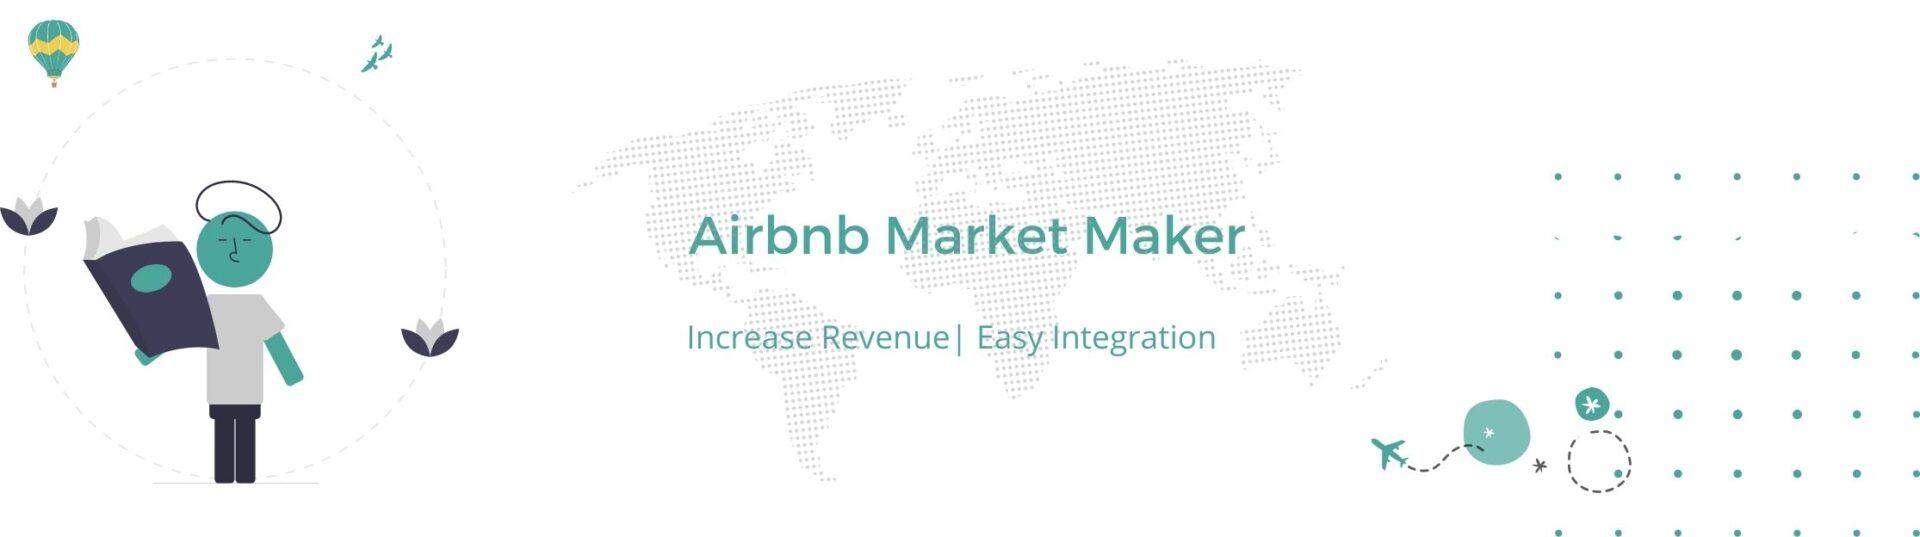 Airbnb Market Maker Banner